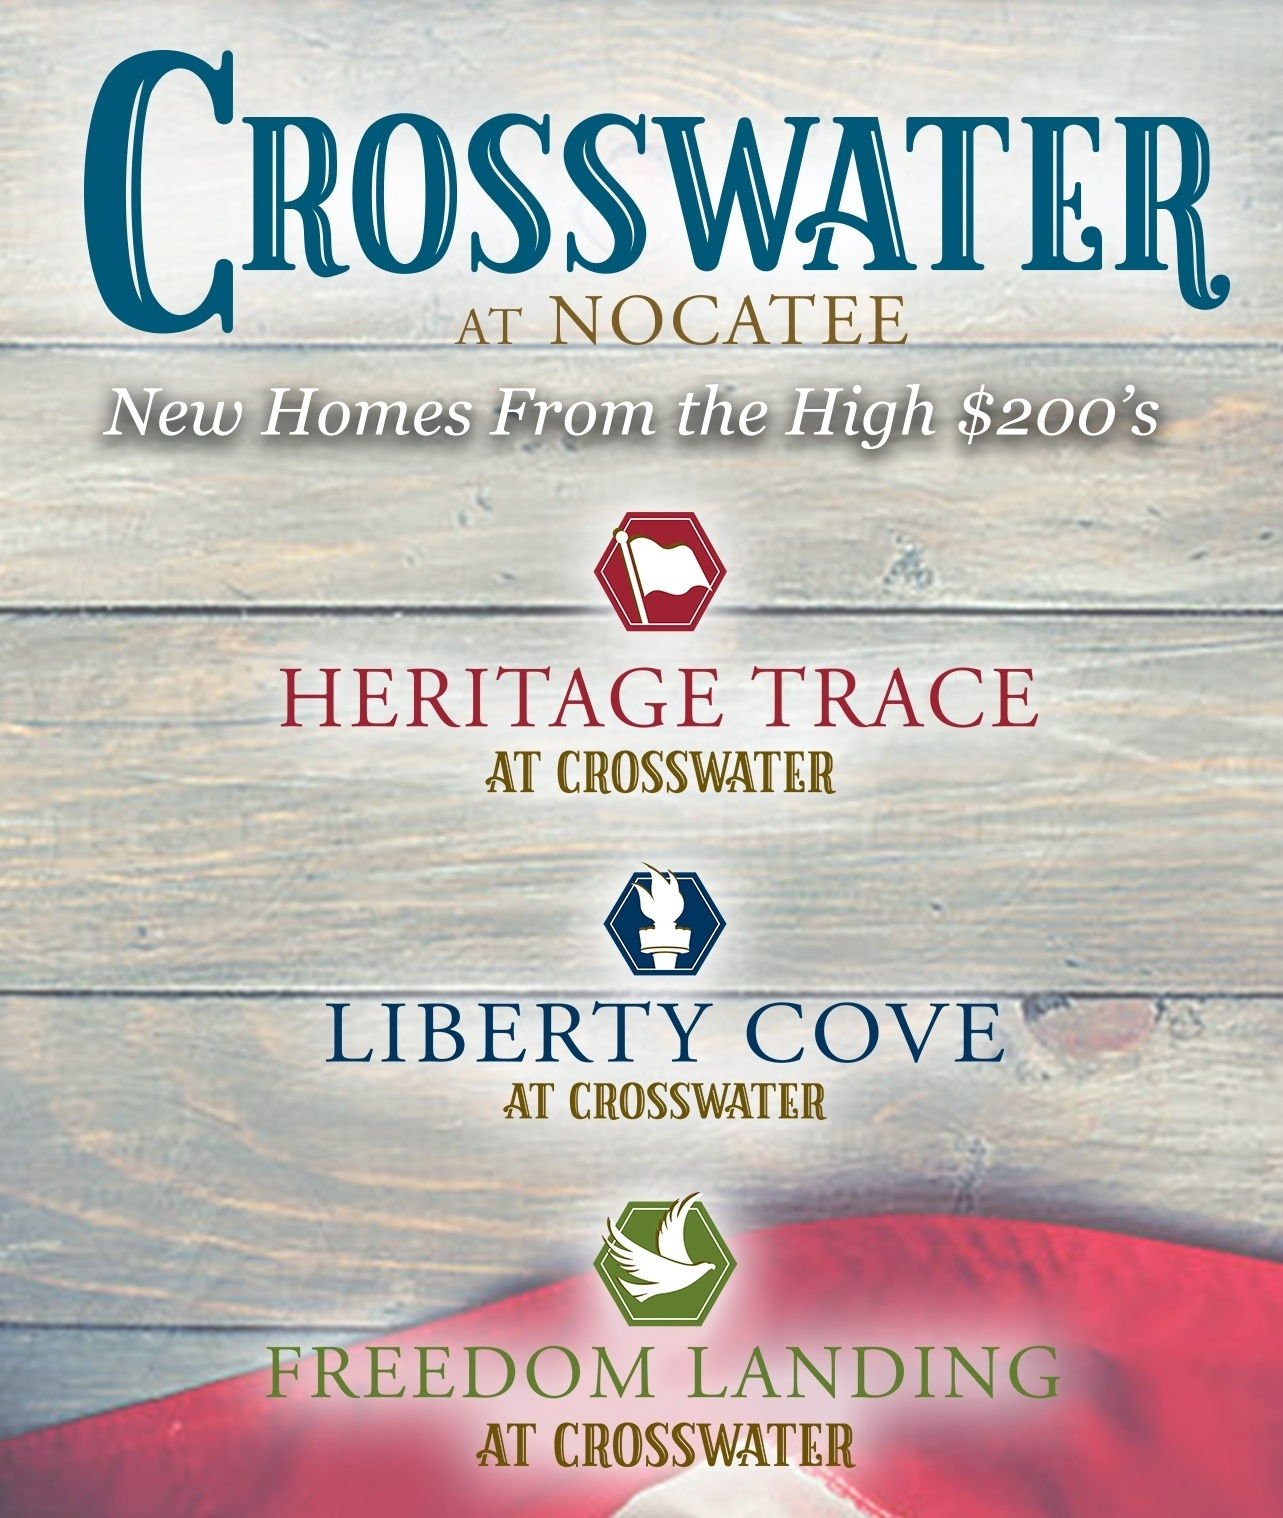 Crosswater-annoucement-insta- cropped.jpg